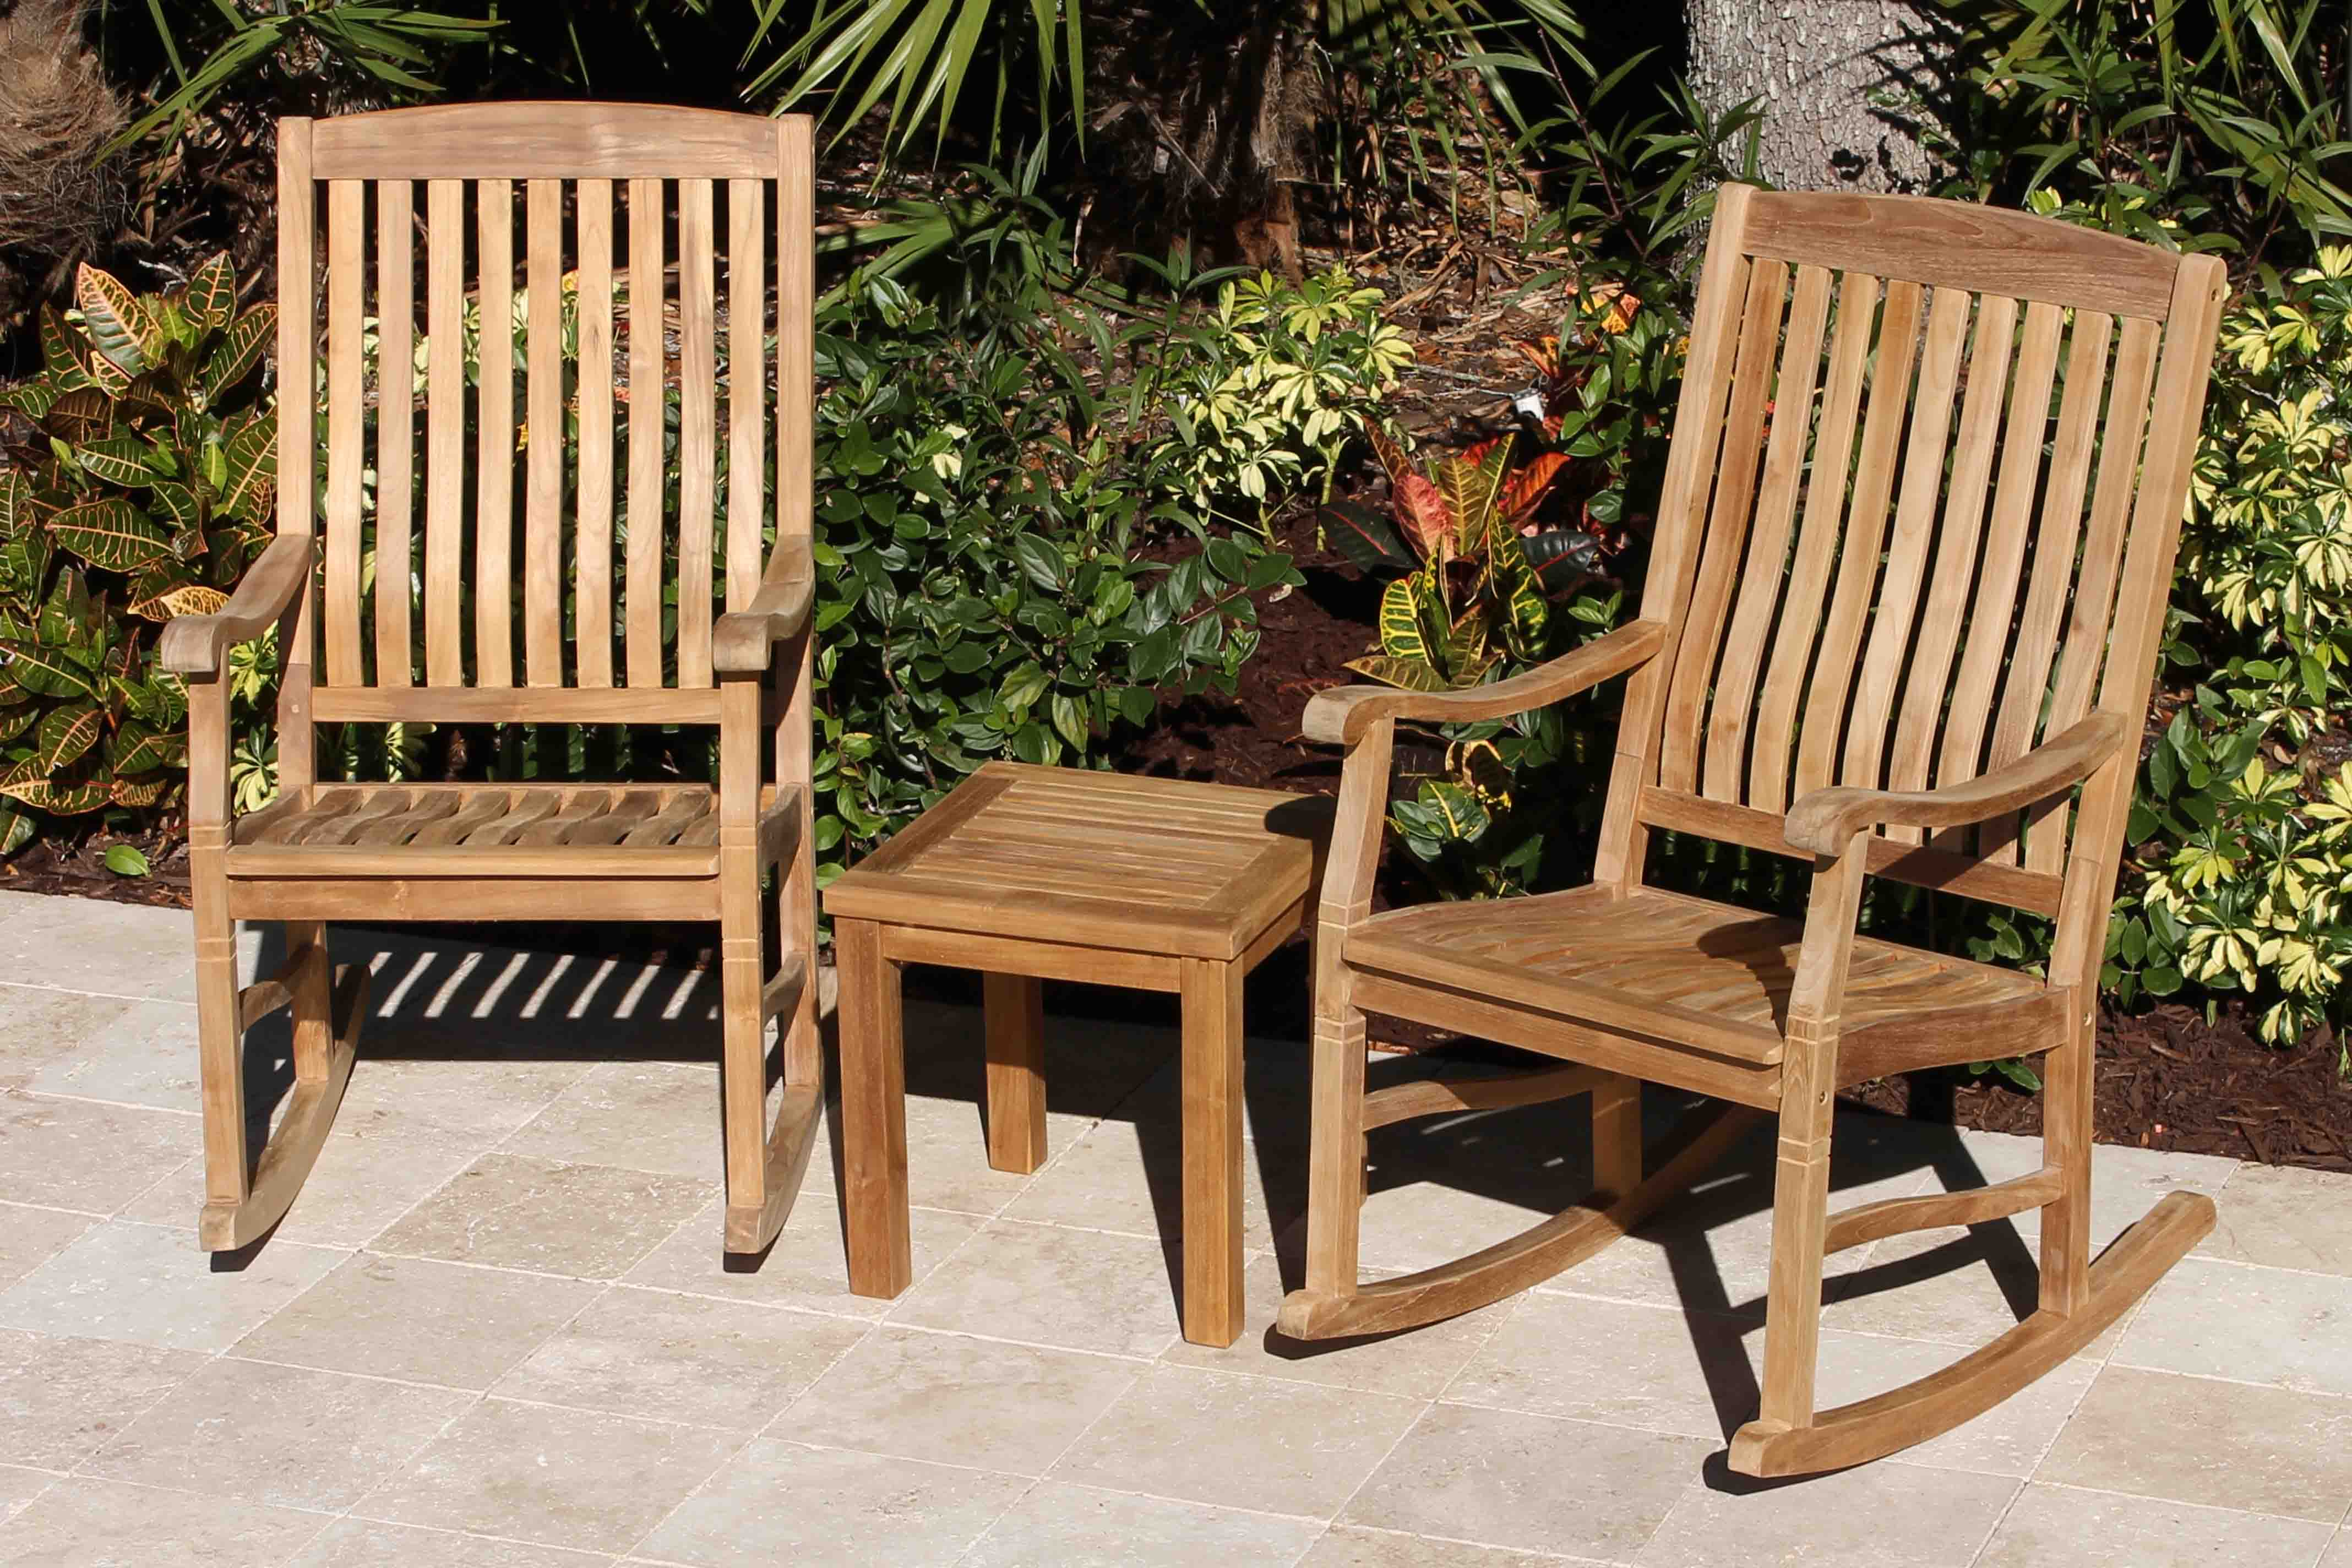 Set Of 2 Teak Rocking Chairs 18in Side Table Oceanic Teak Furniture